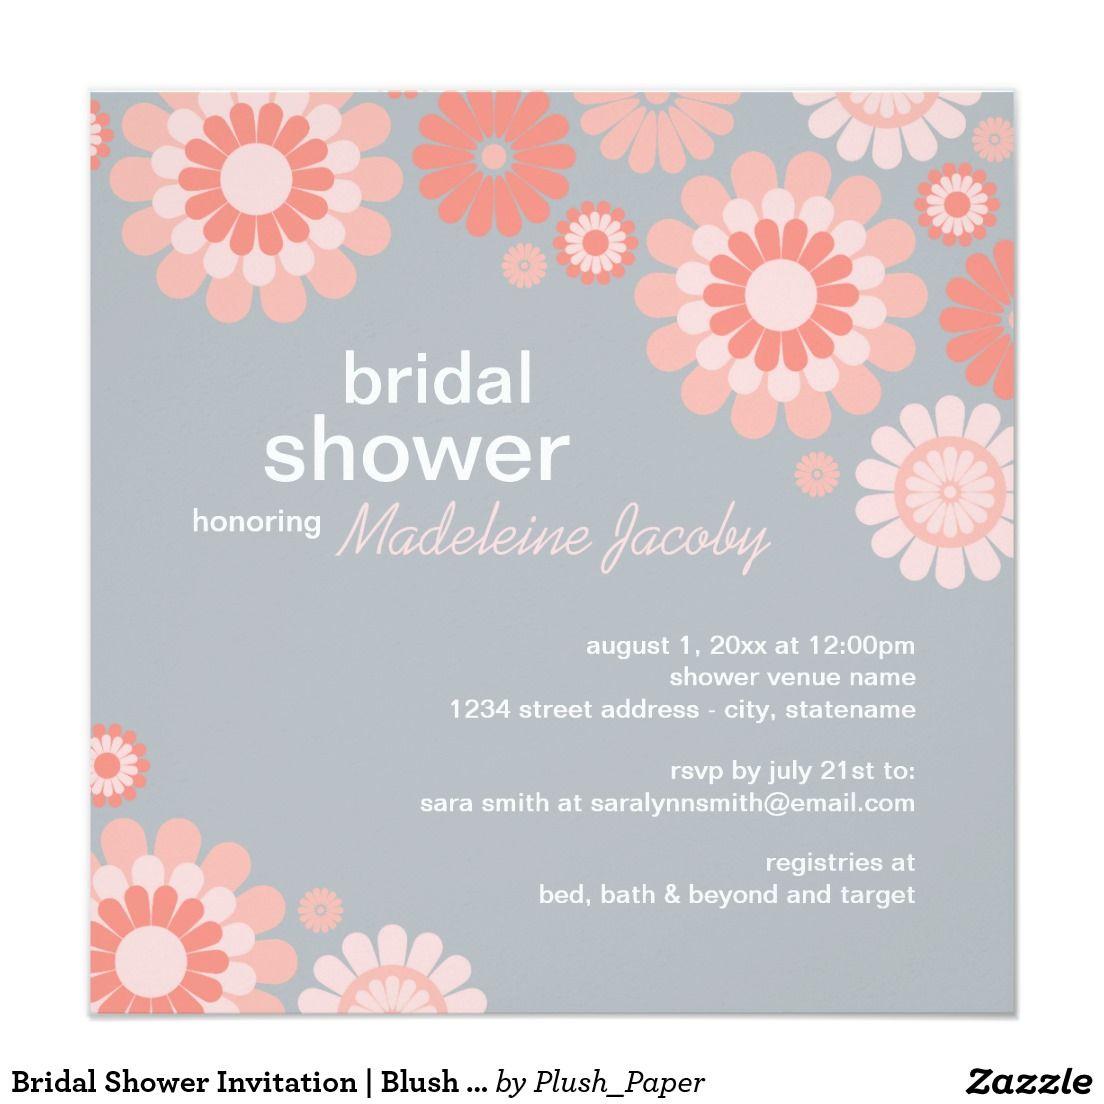 Bridal Shower Invitation | Blush Coral Pink Daisy | Pink daisy ...